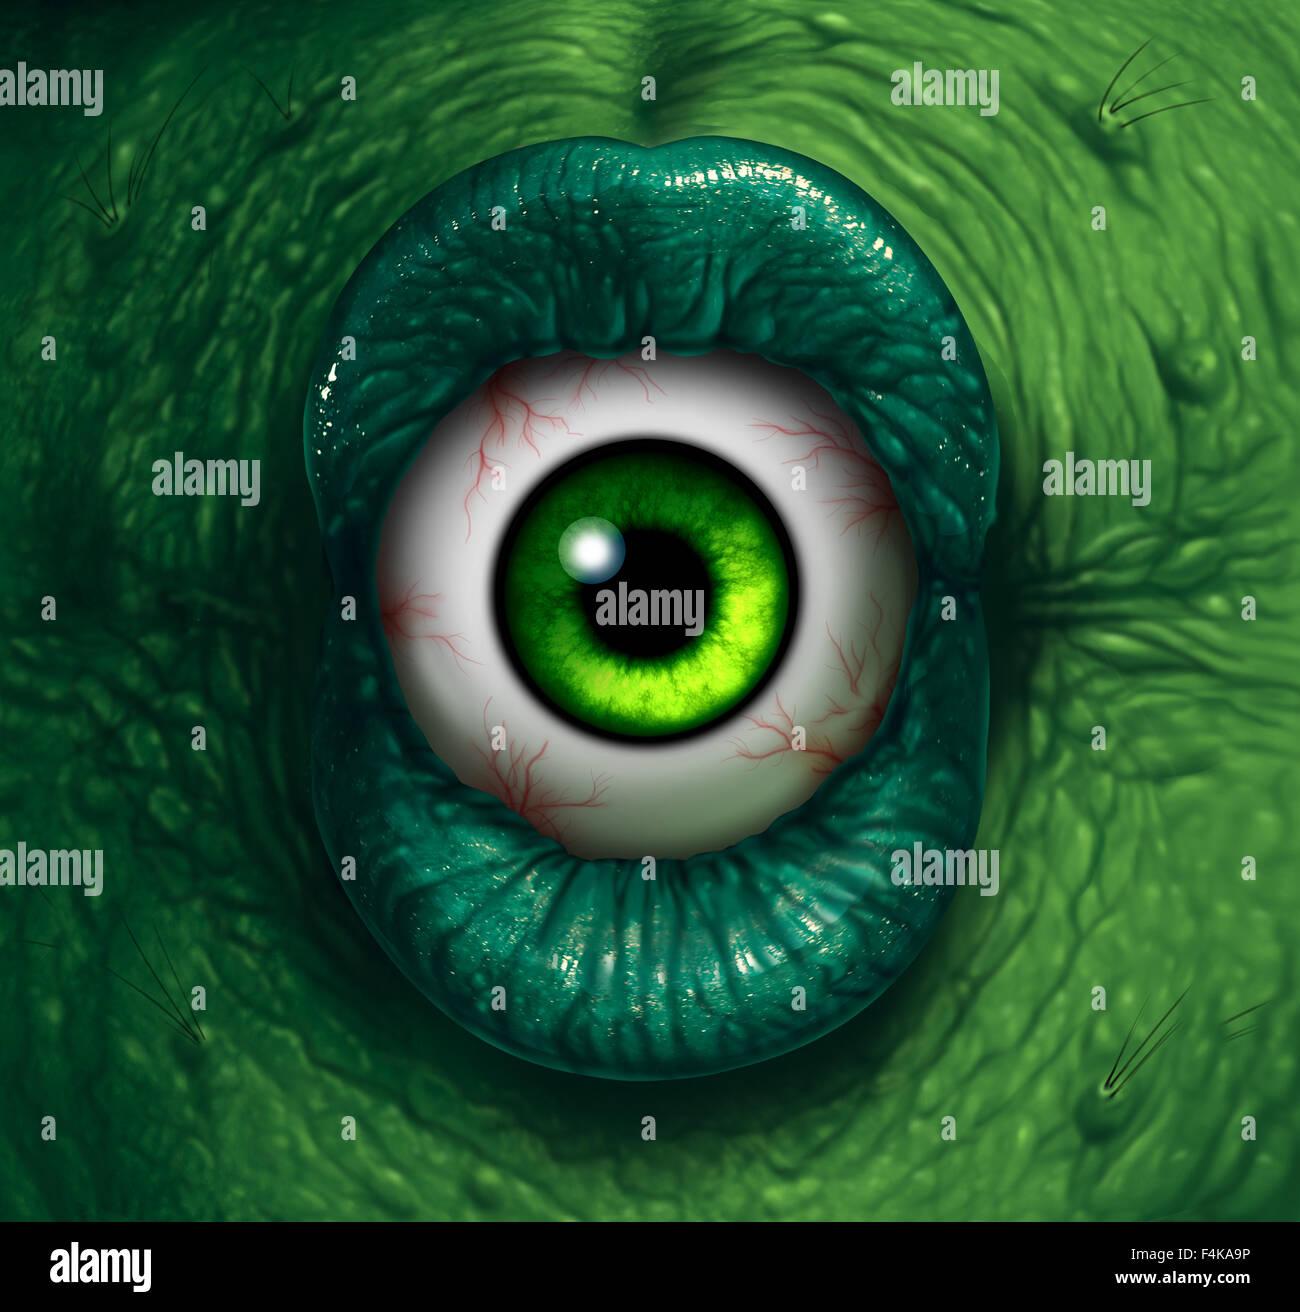 Monster eye halloween demonio ogro closeup con labios morder mal verde en un repugnante globo ocular como una pesadilla aterradora bruja zombie o concepto. Foto de stock